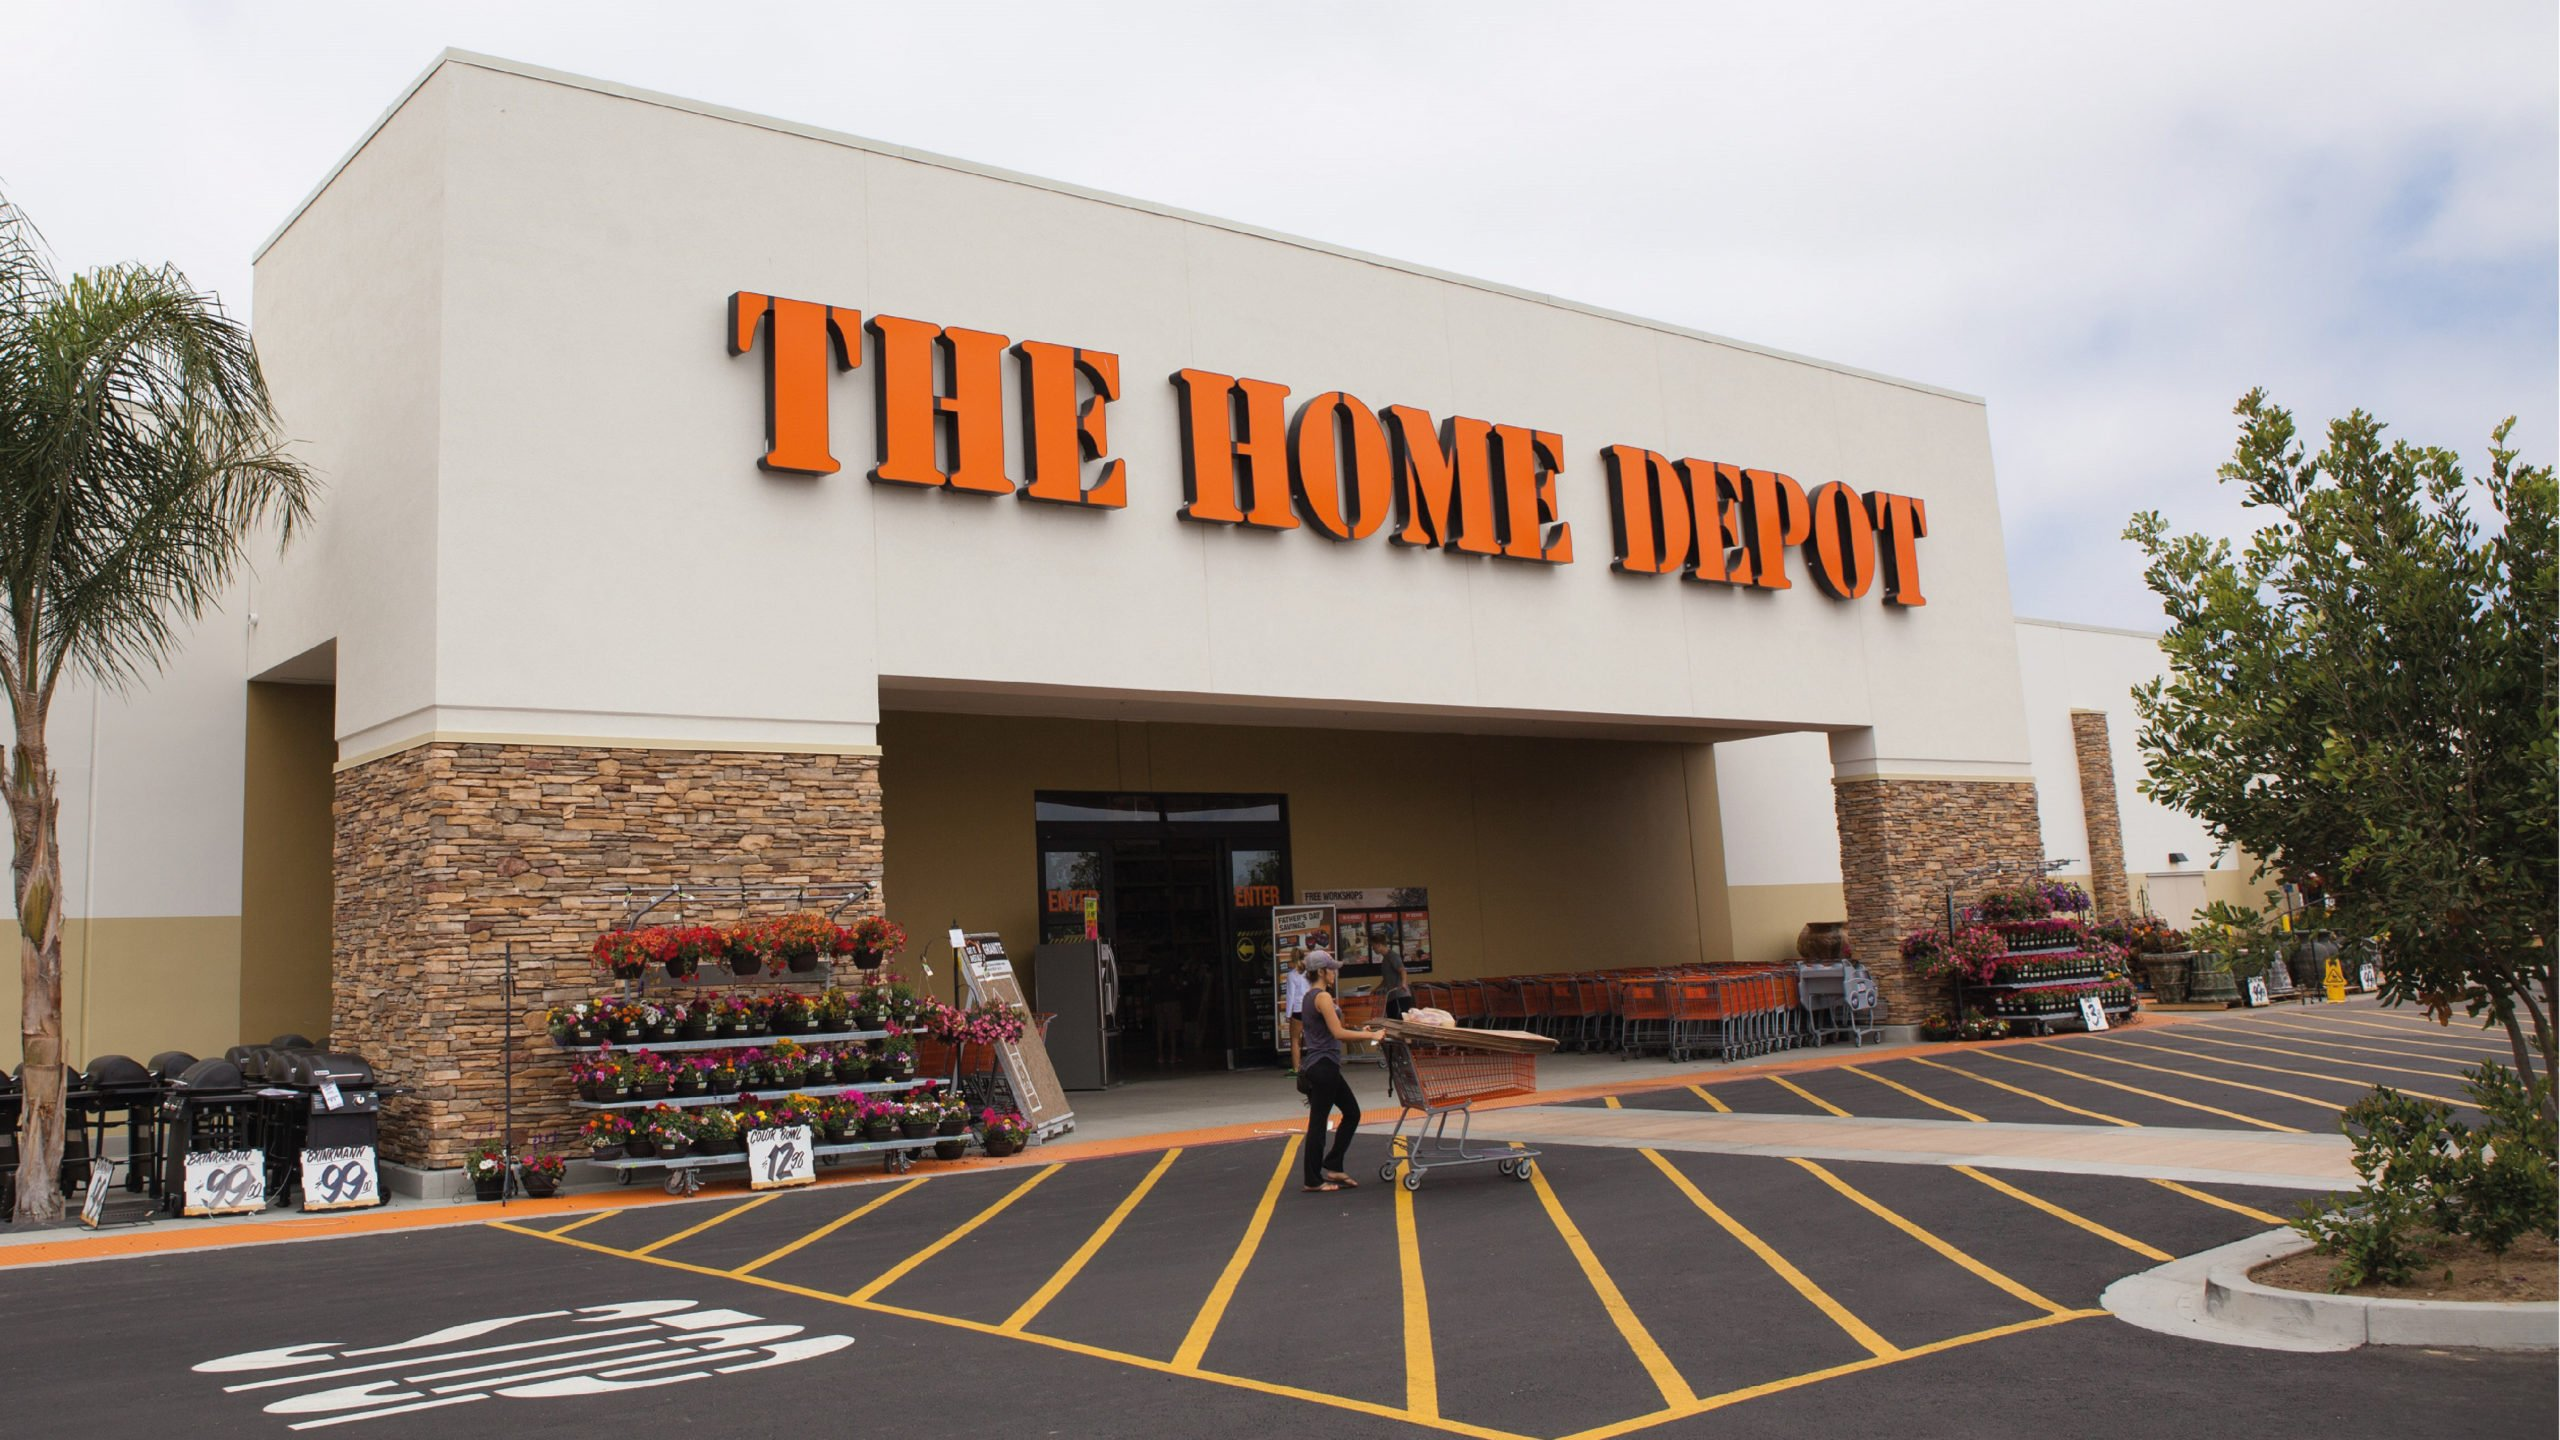 Home Depot gana 4,145 mdd en primer trimestre, un 85% más